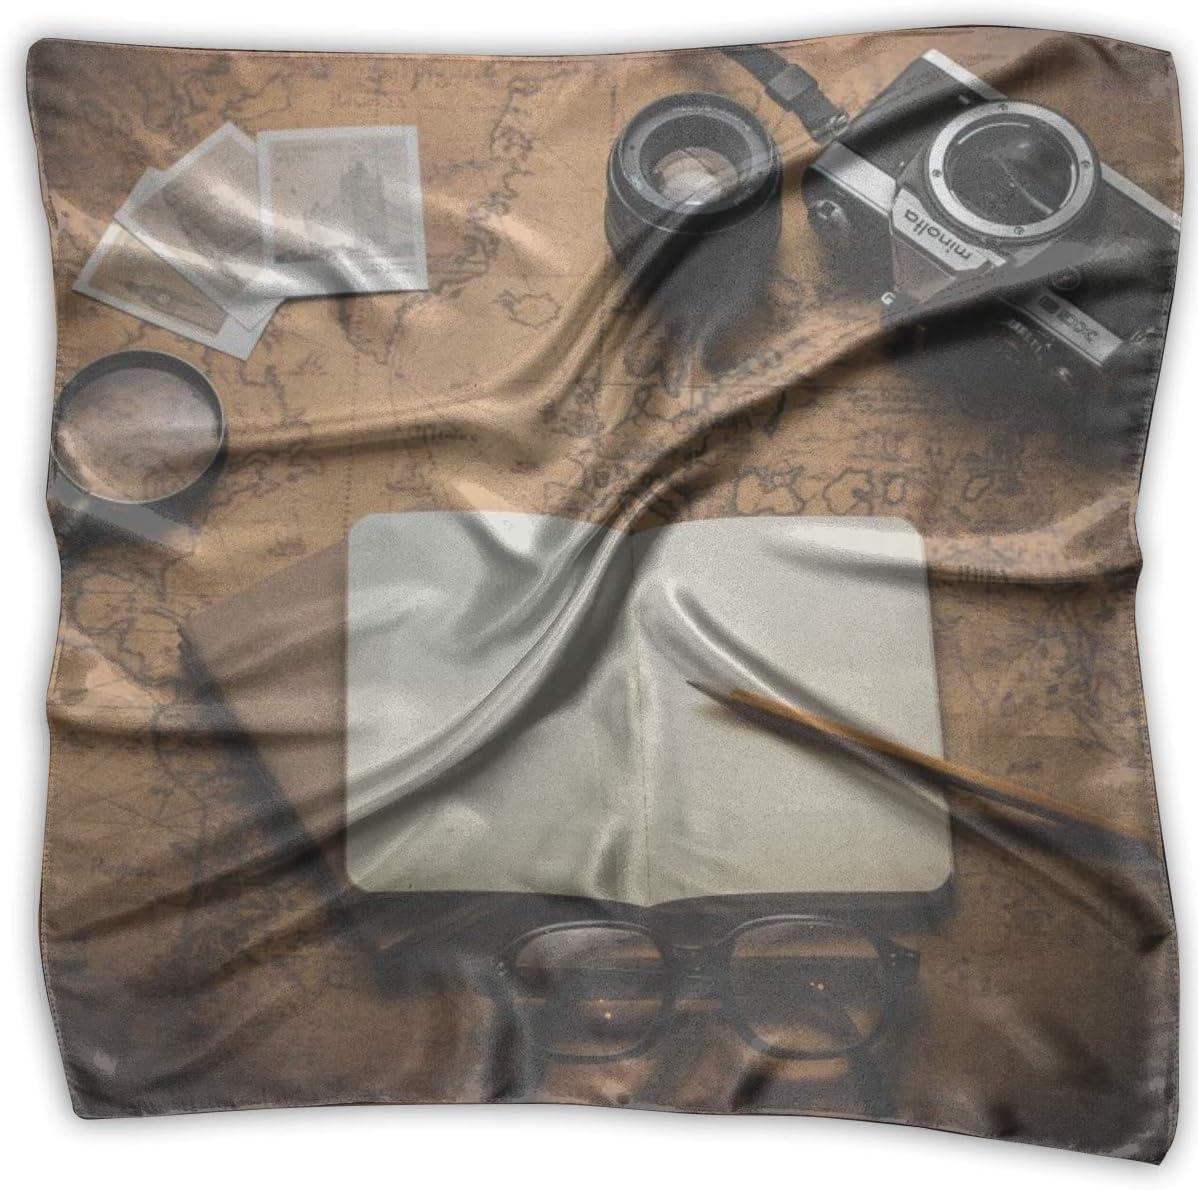 YANGZXC Vintage Style Old World Map Photo Cameras Handkerchief Polyester Pocket Square Mulipurpose Silk Bandanas Delicate Printing